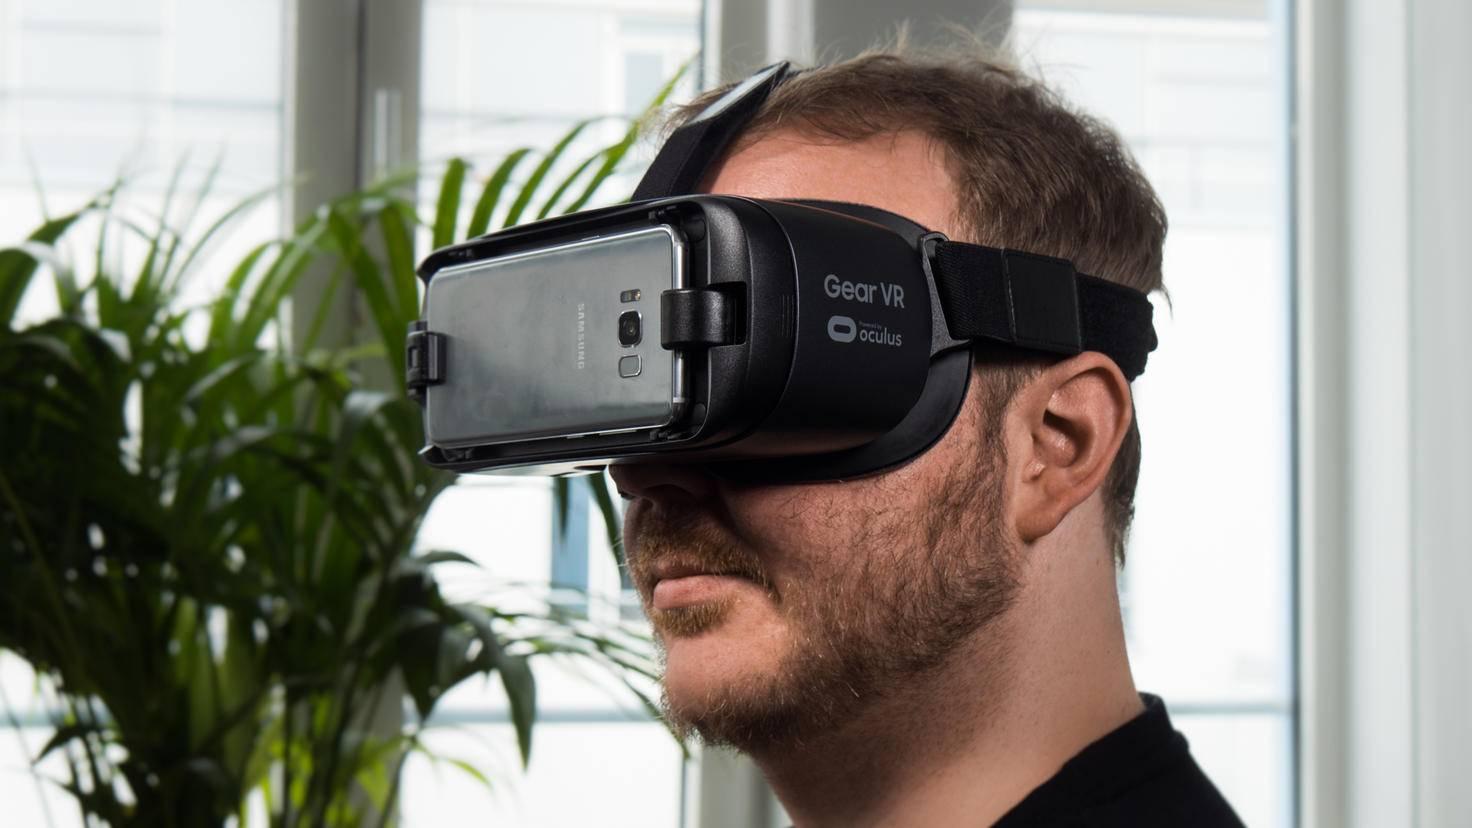 Samsung-Gear-VR-2017-1